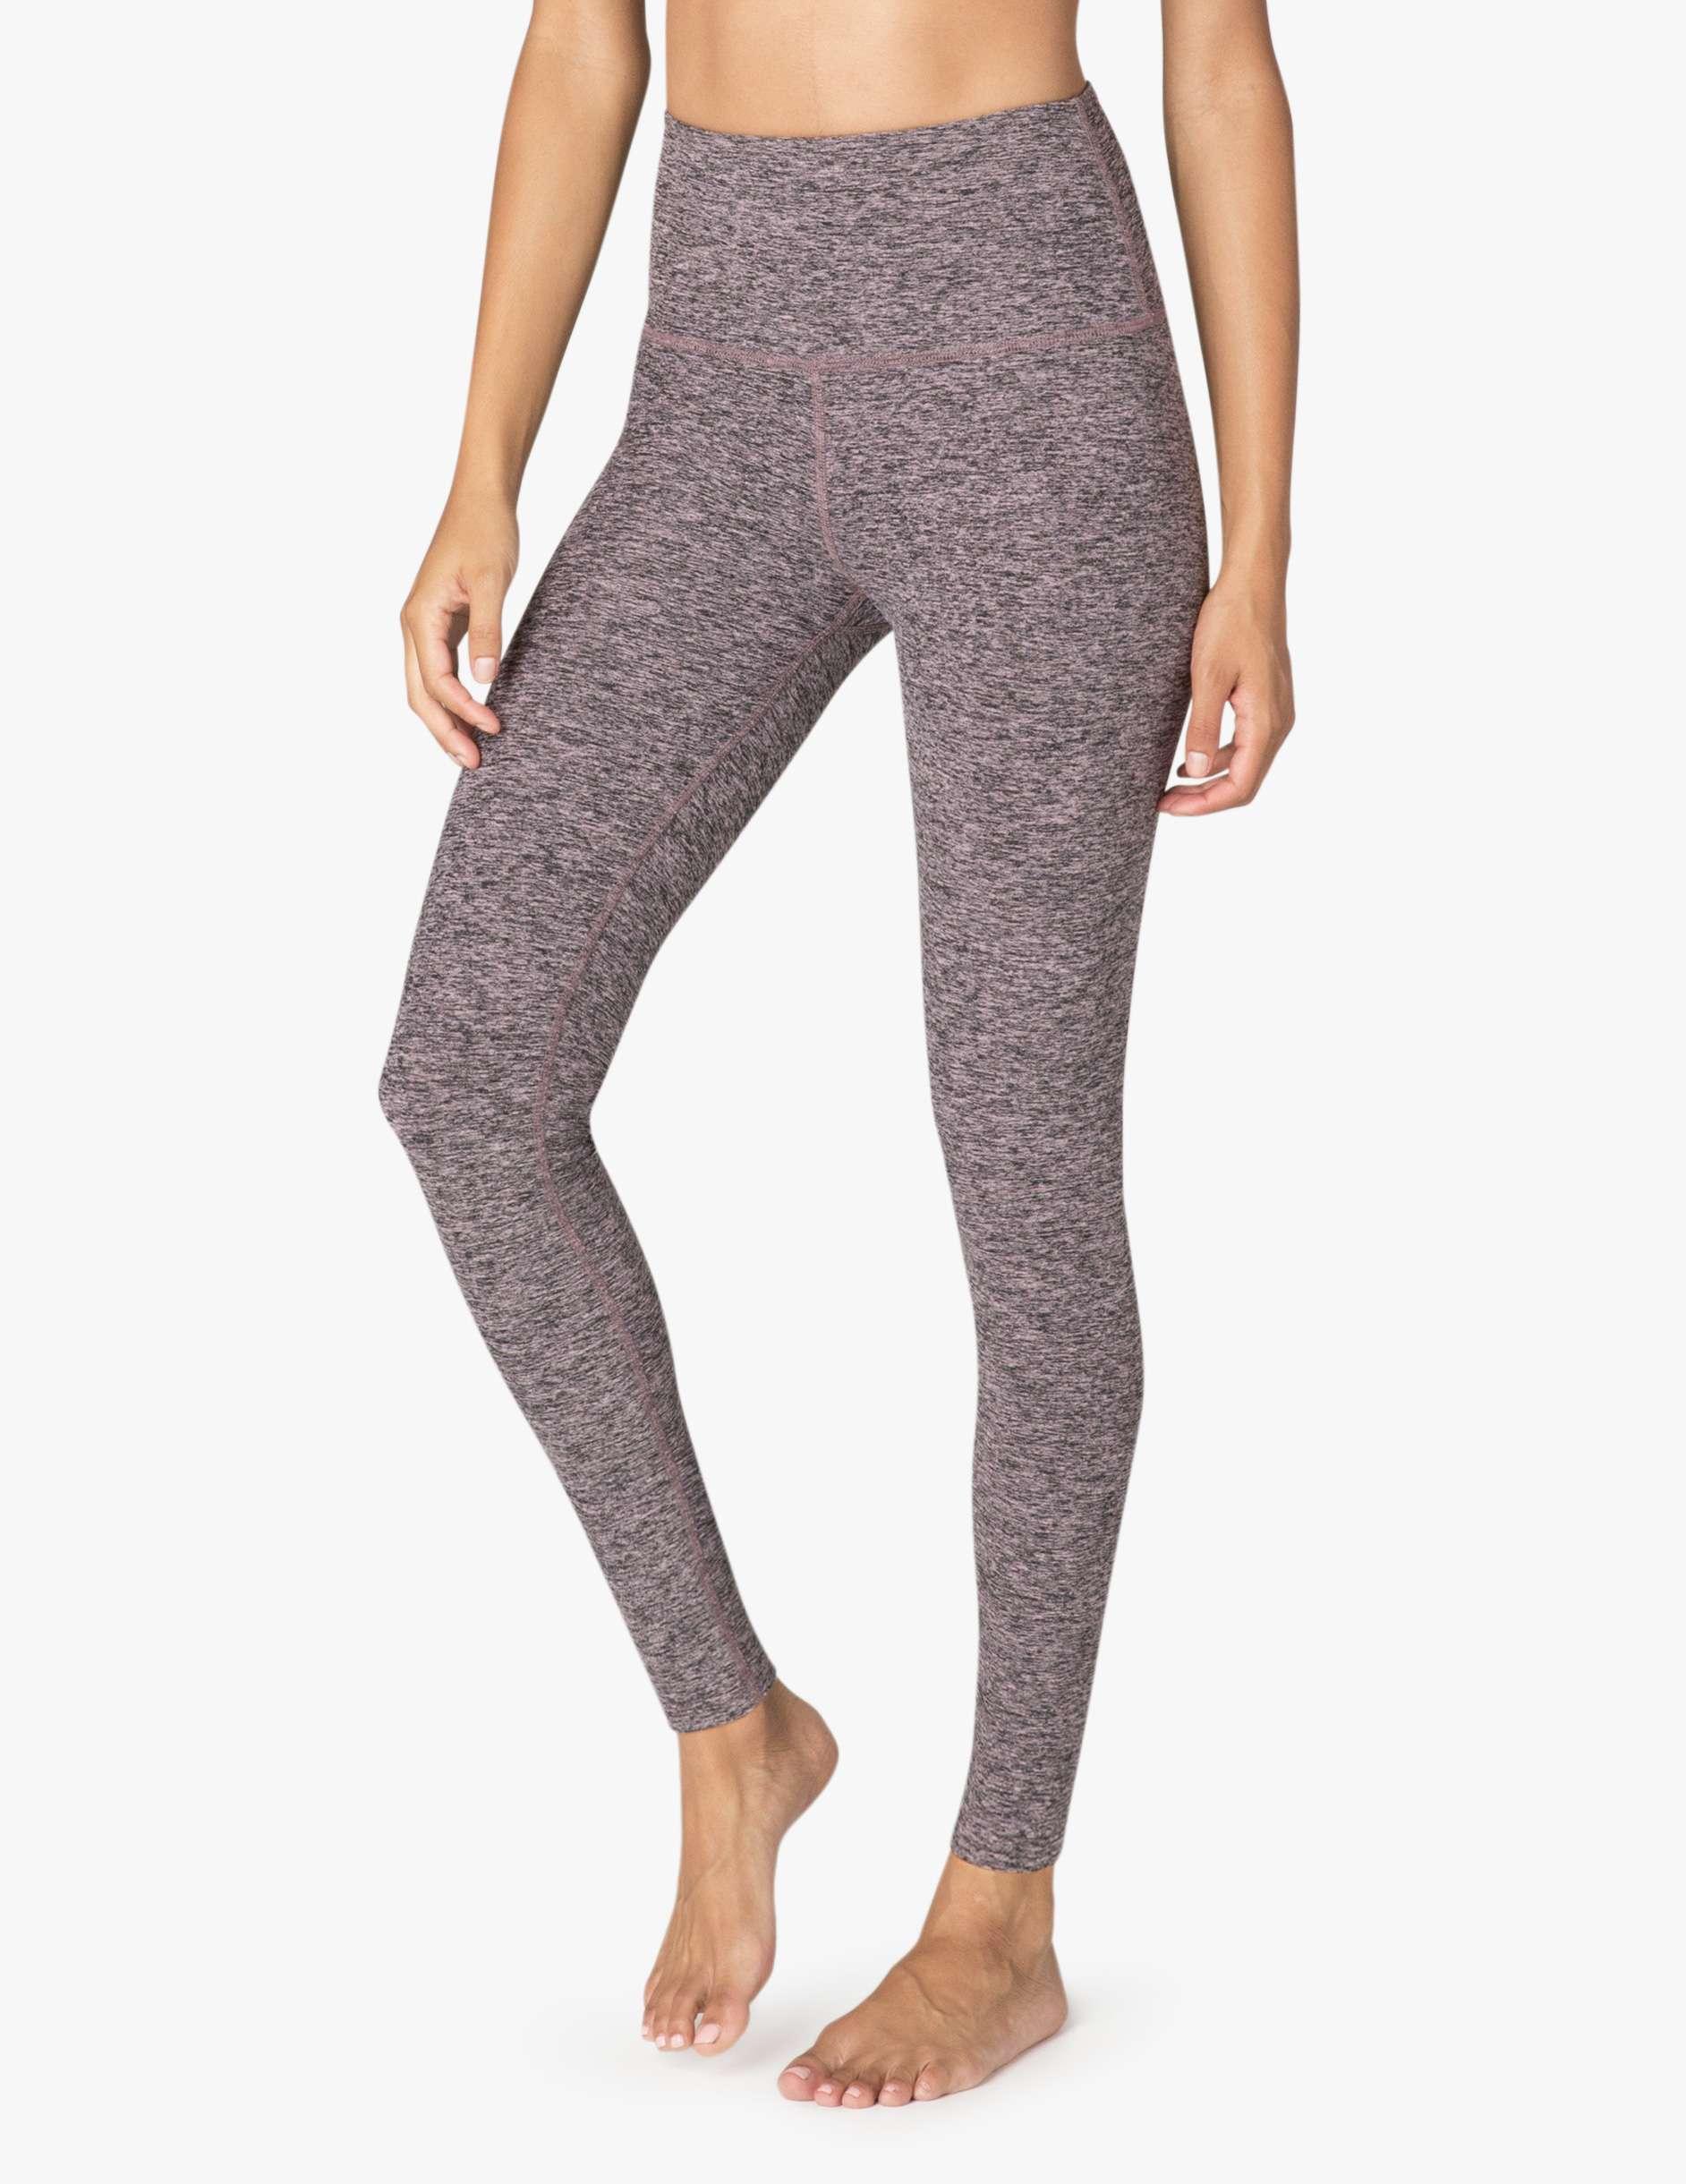 Beyond Yoga Spacedye High Waist Yoga leggings full length black pink opal